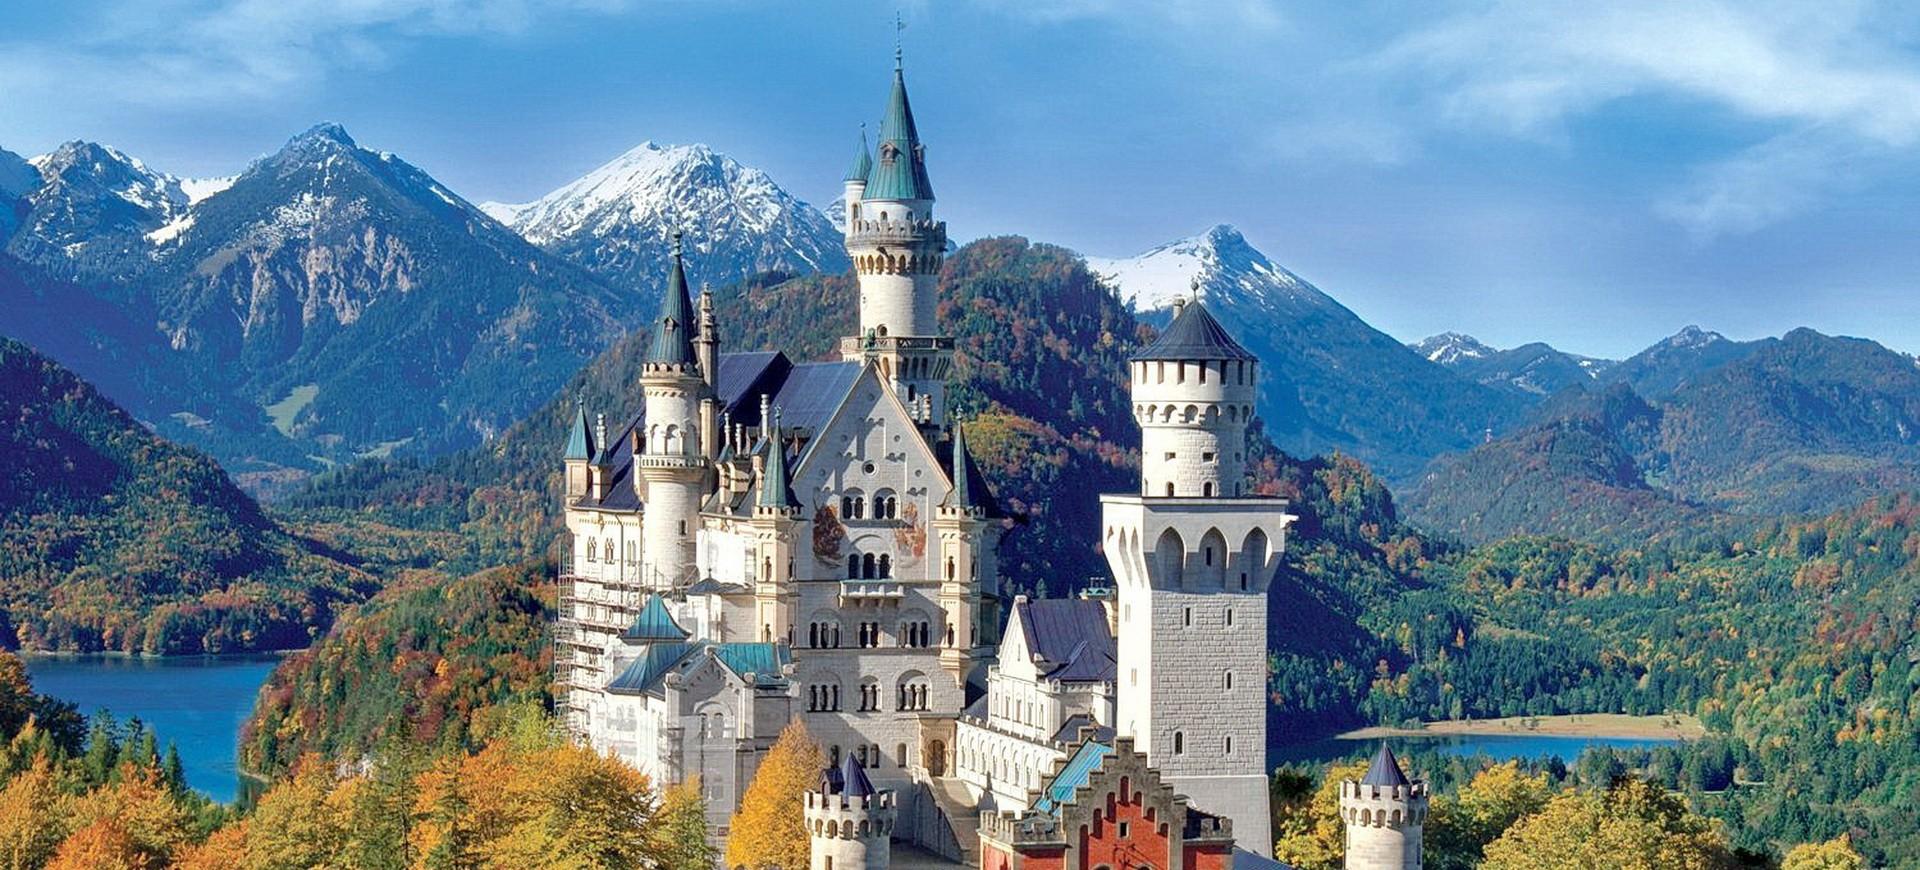 Château Neuschwanstein à Fussen en Allemagne